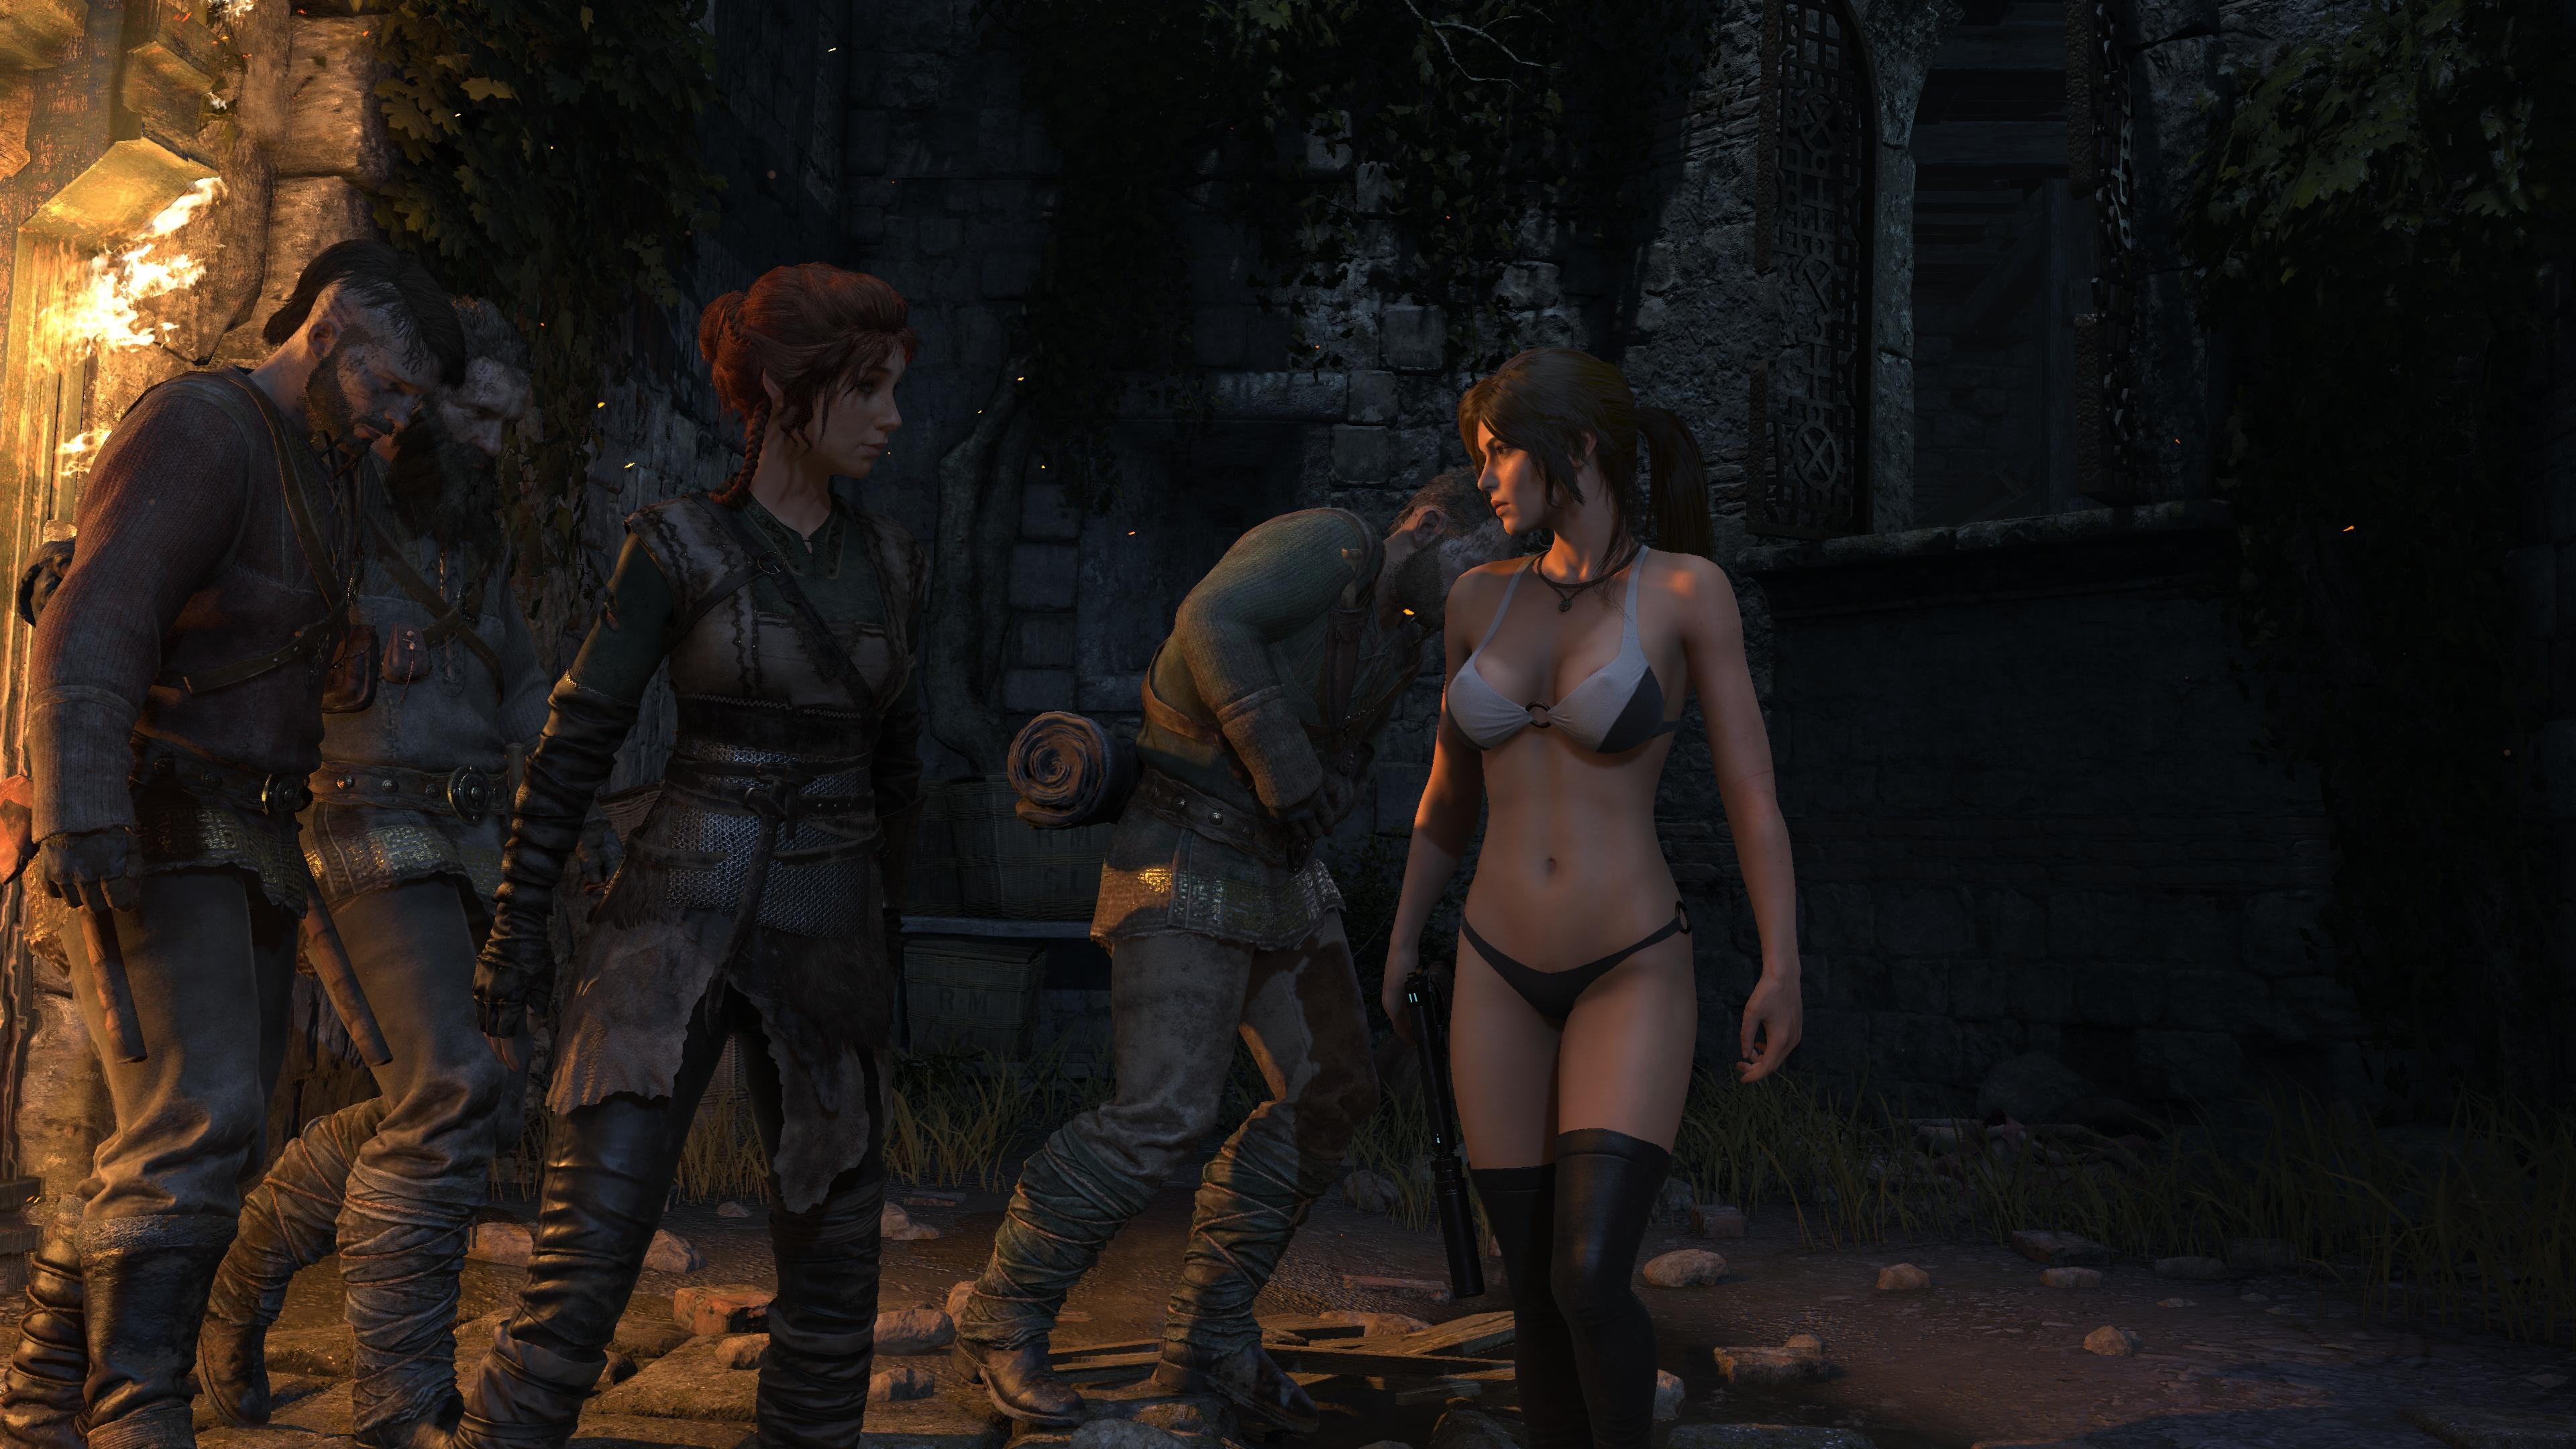 ROTTR_2021_06_29_01_43_36_707.jpg - Rise of the Tomb Raider